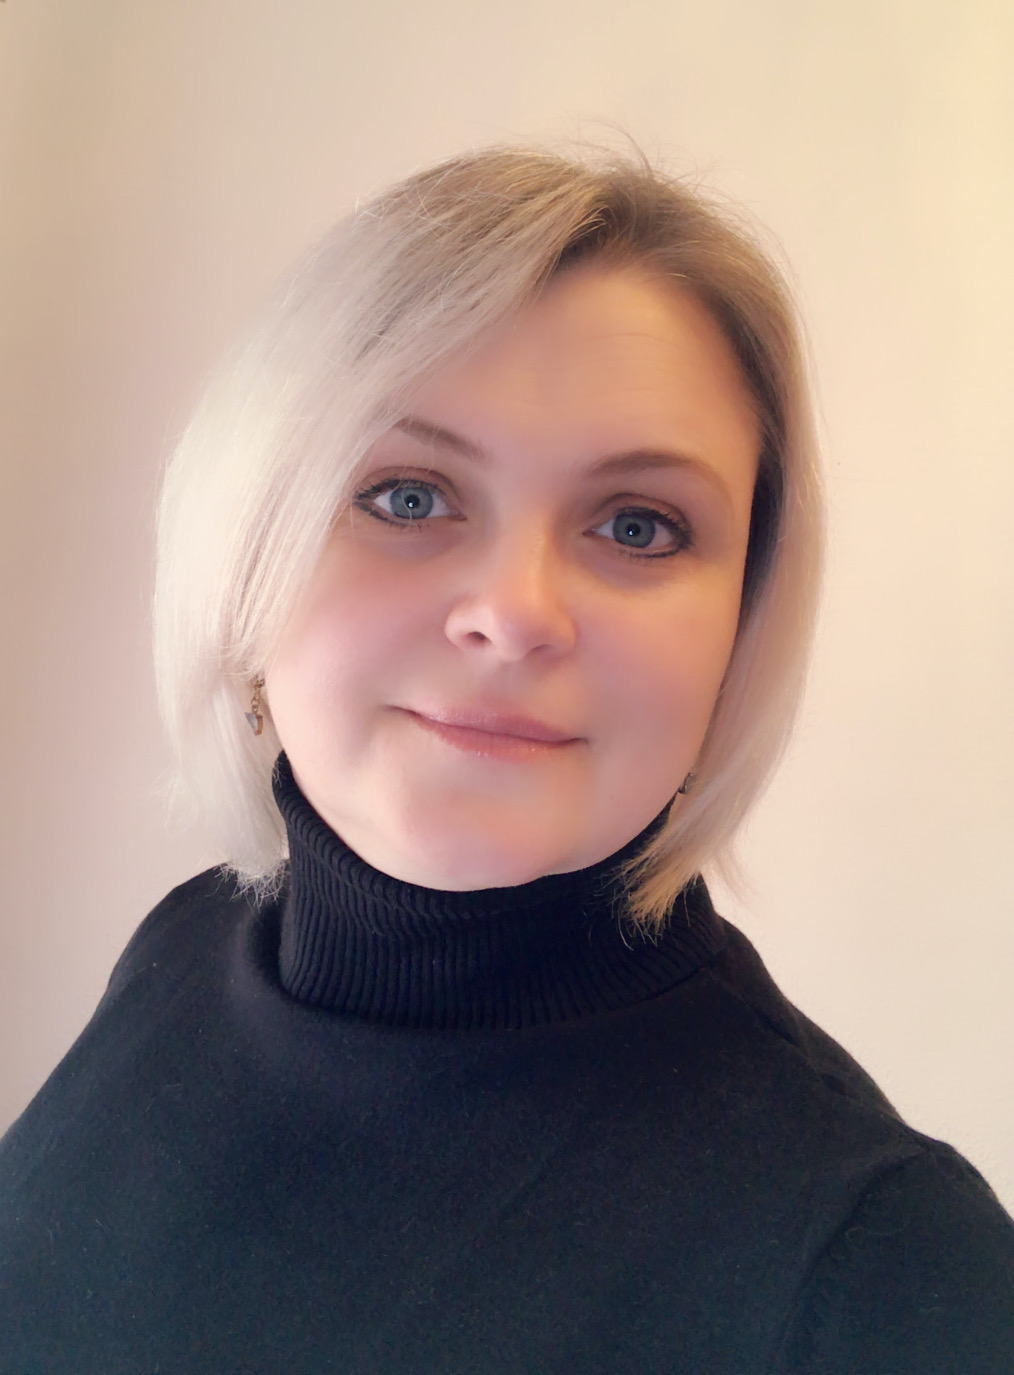 "Kreative psychologische Beratung ""wechsle Deine Perspektive"" Irina Hempel"